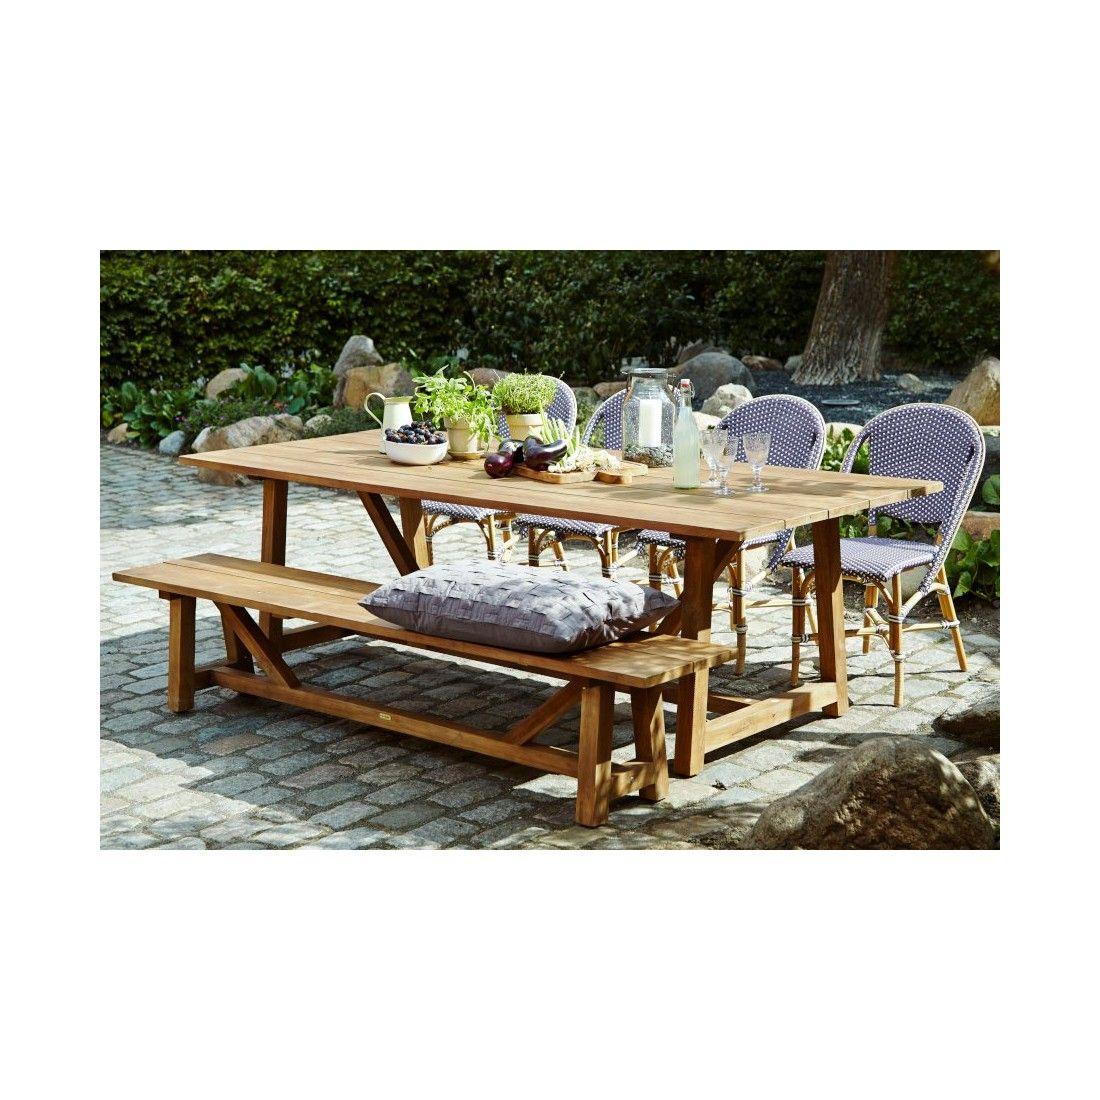 Banc de table de jardin en teck ancien 220 cm